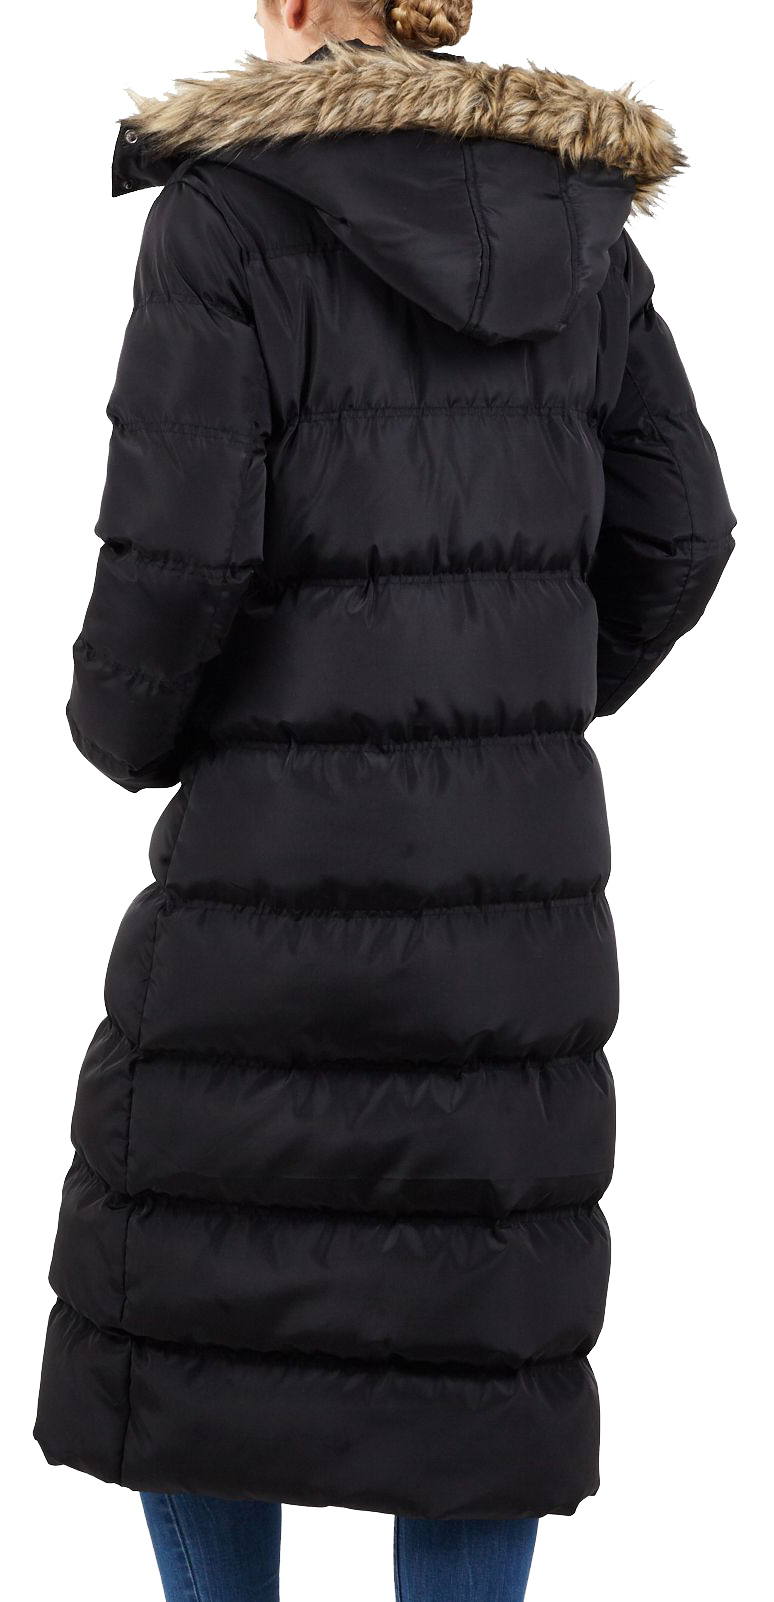 Ladies Long Maxi Short Warm Winter Puffer Jacket Faux Fur